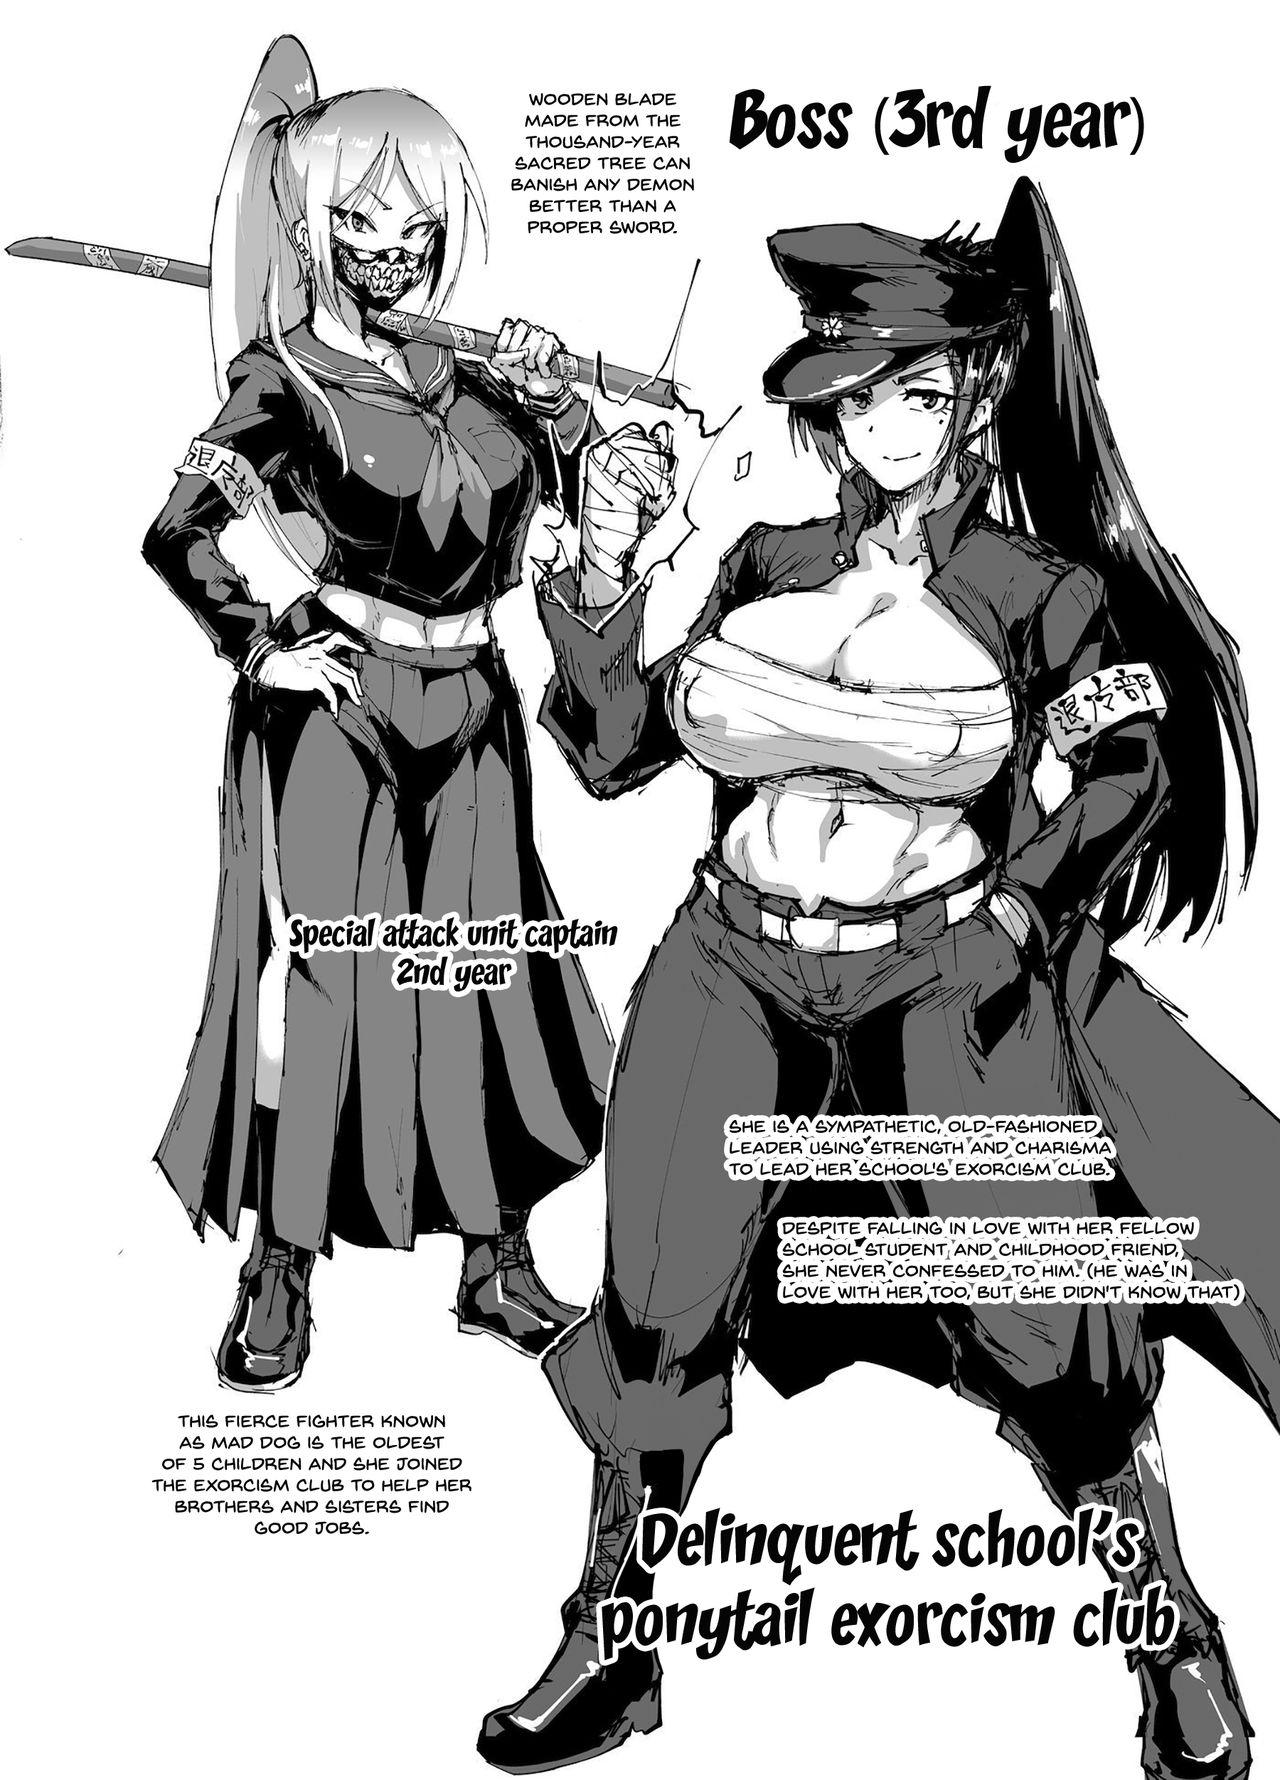 Kurokami Ponytail Tsurime JK Taimabu Rakugaki   Exorcism Club for Black Haired Girls with Ponytails 11